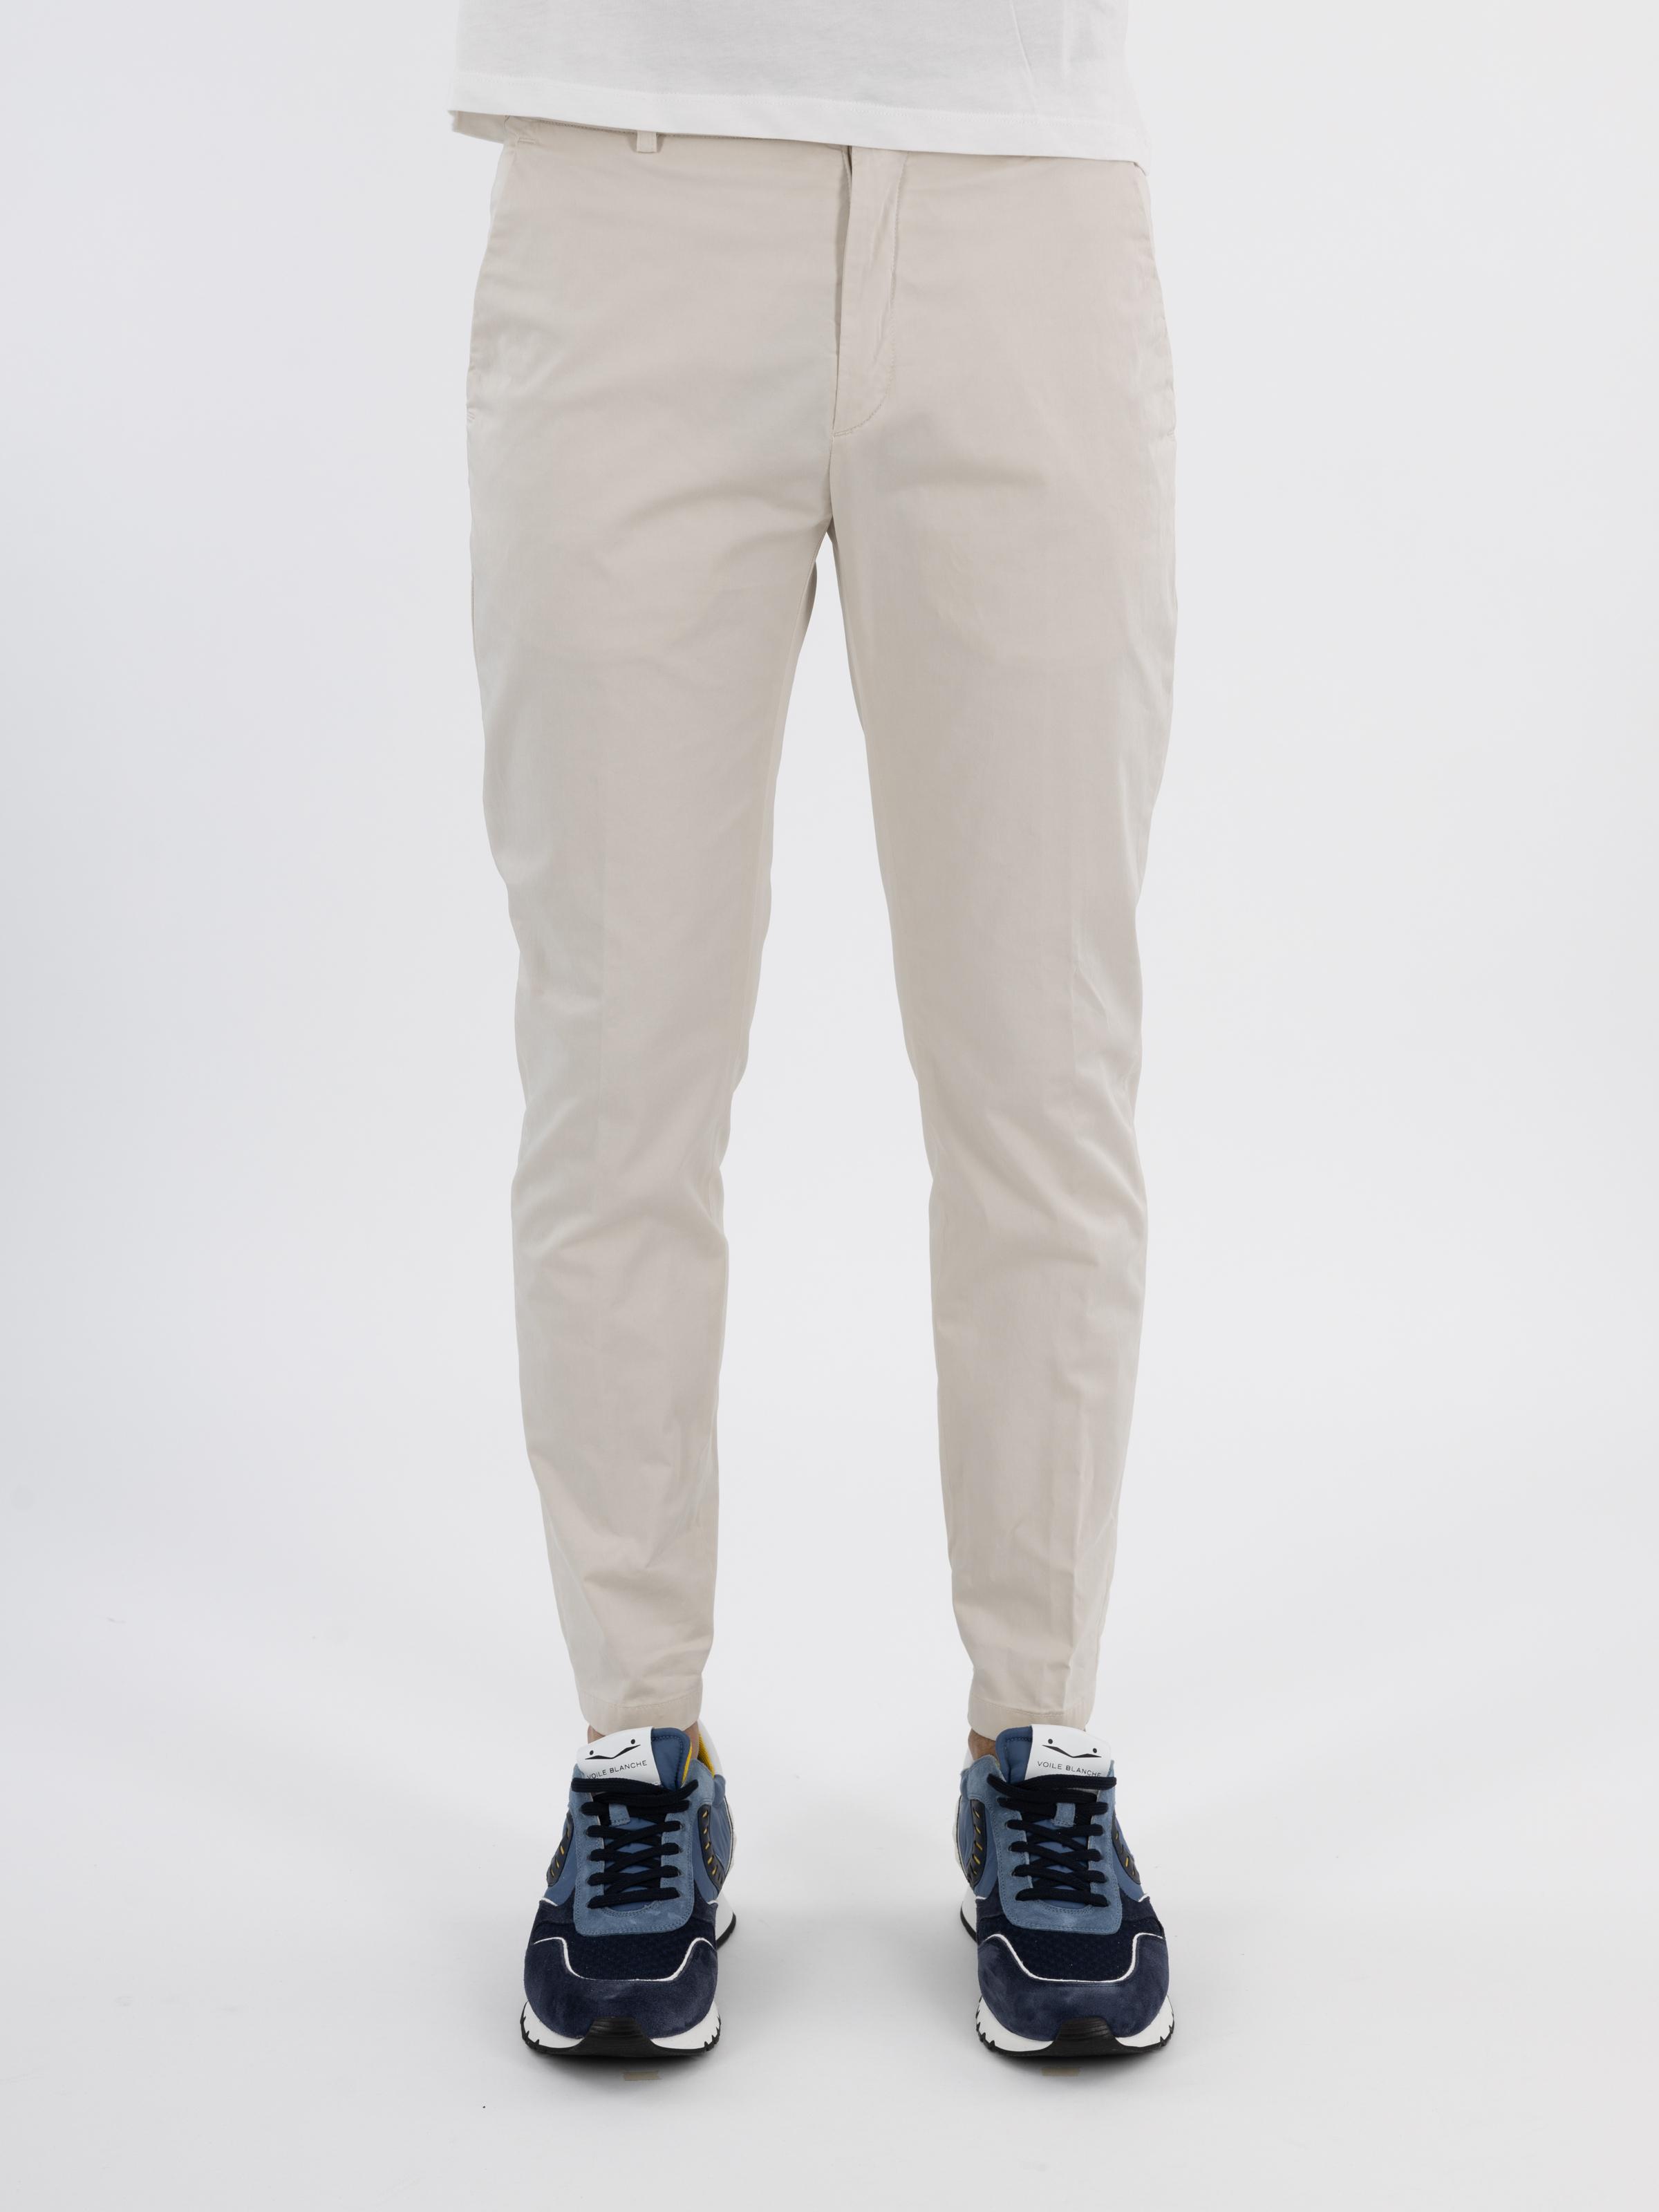 Department Five Pantalone I18P05 T1802